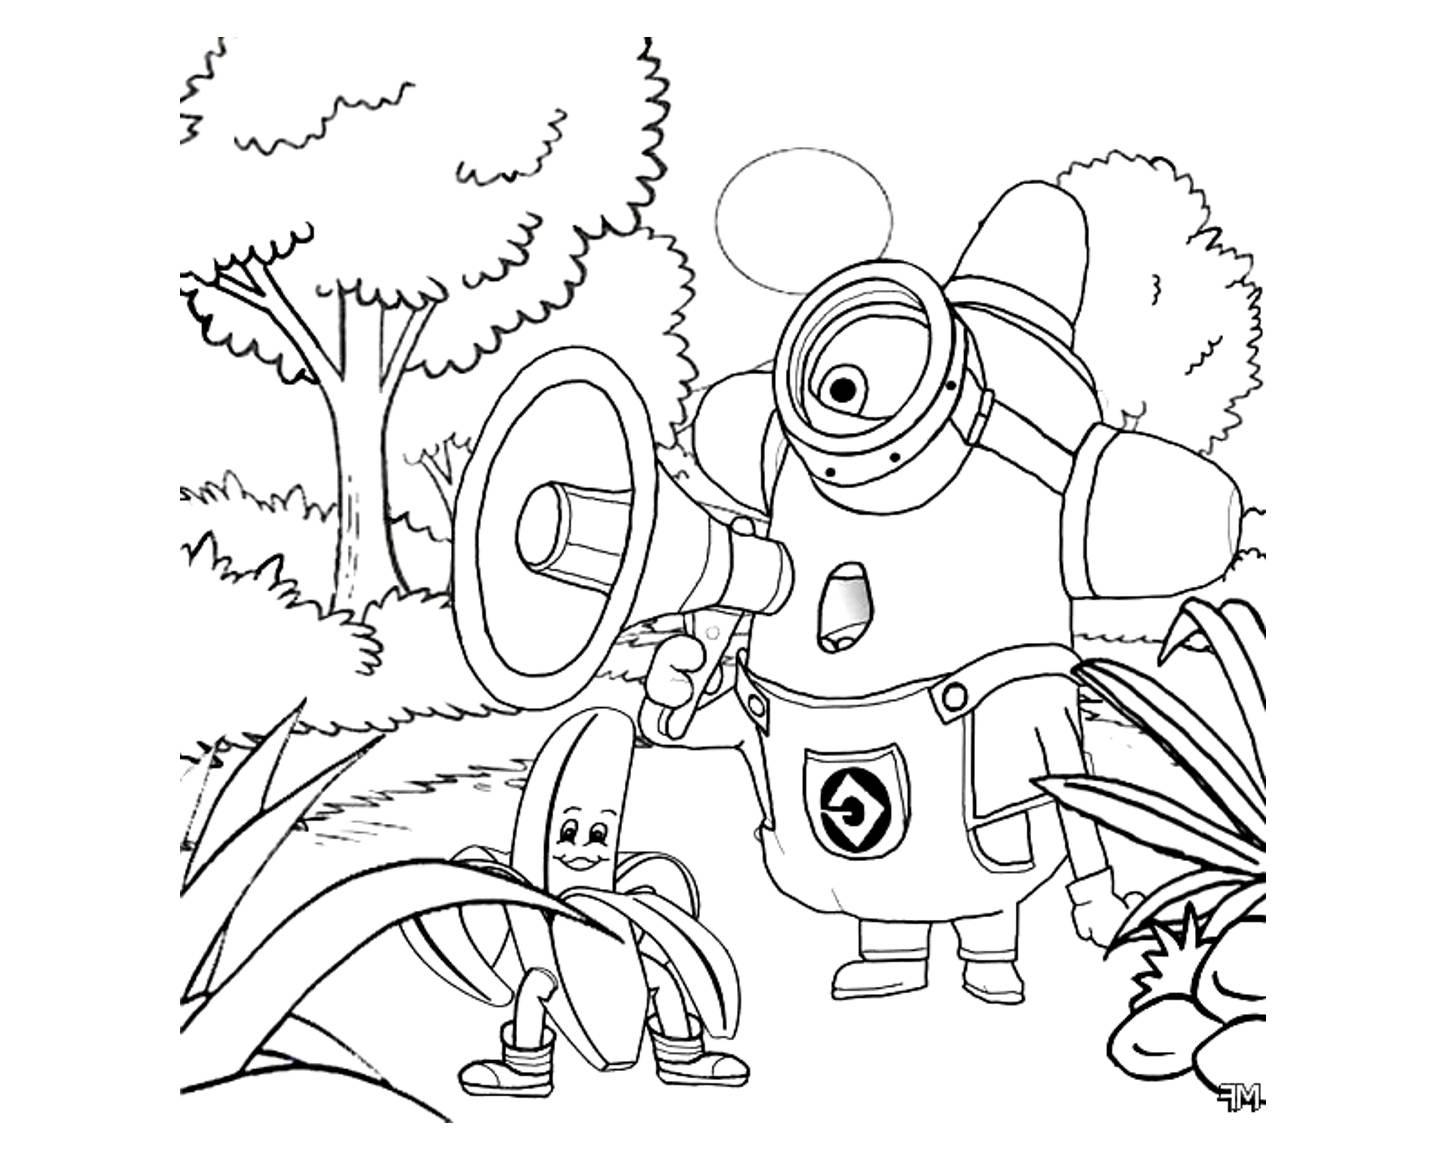 100 Dibujos De Minions Para Colorear Oh Kids Page 8